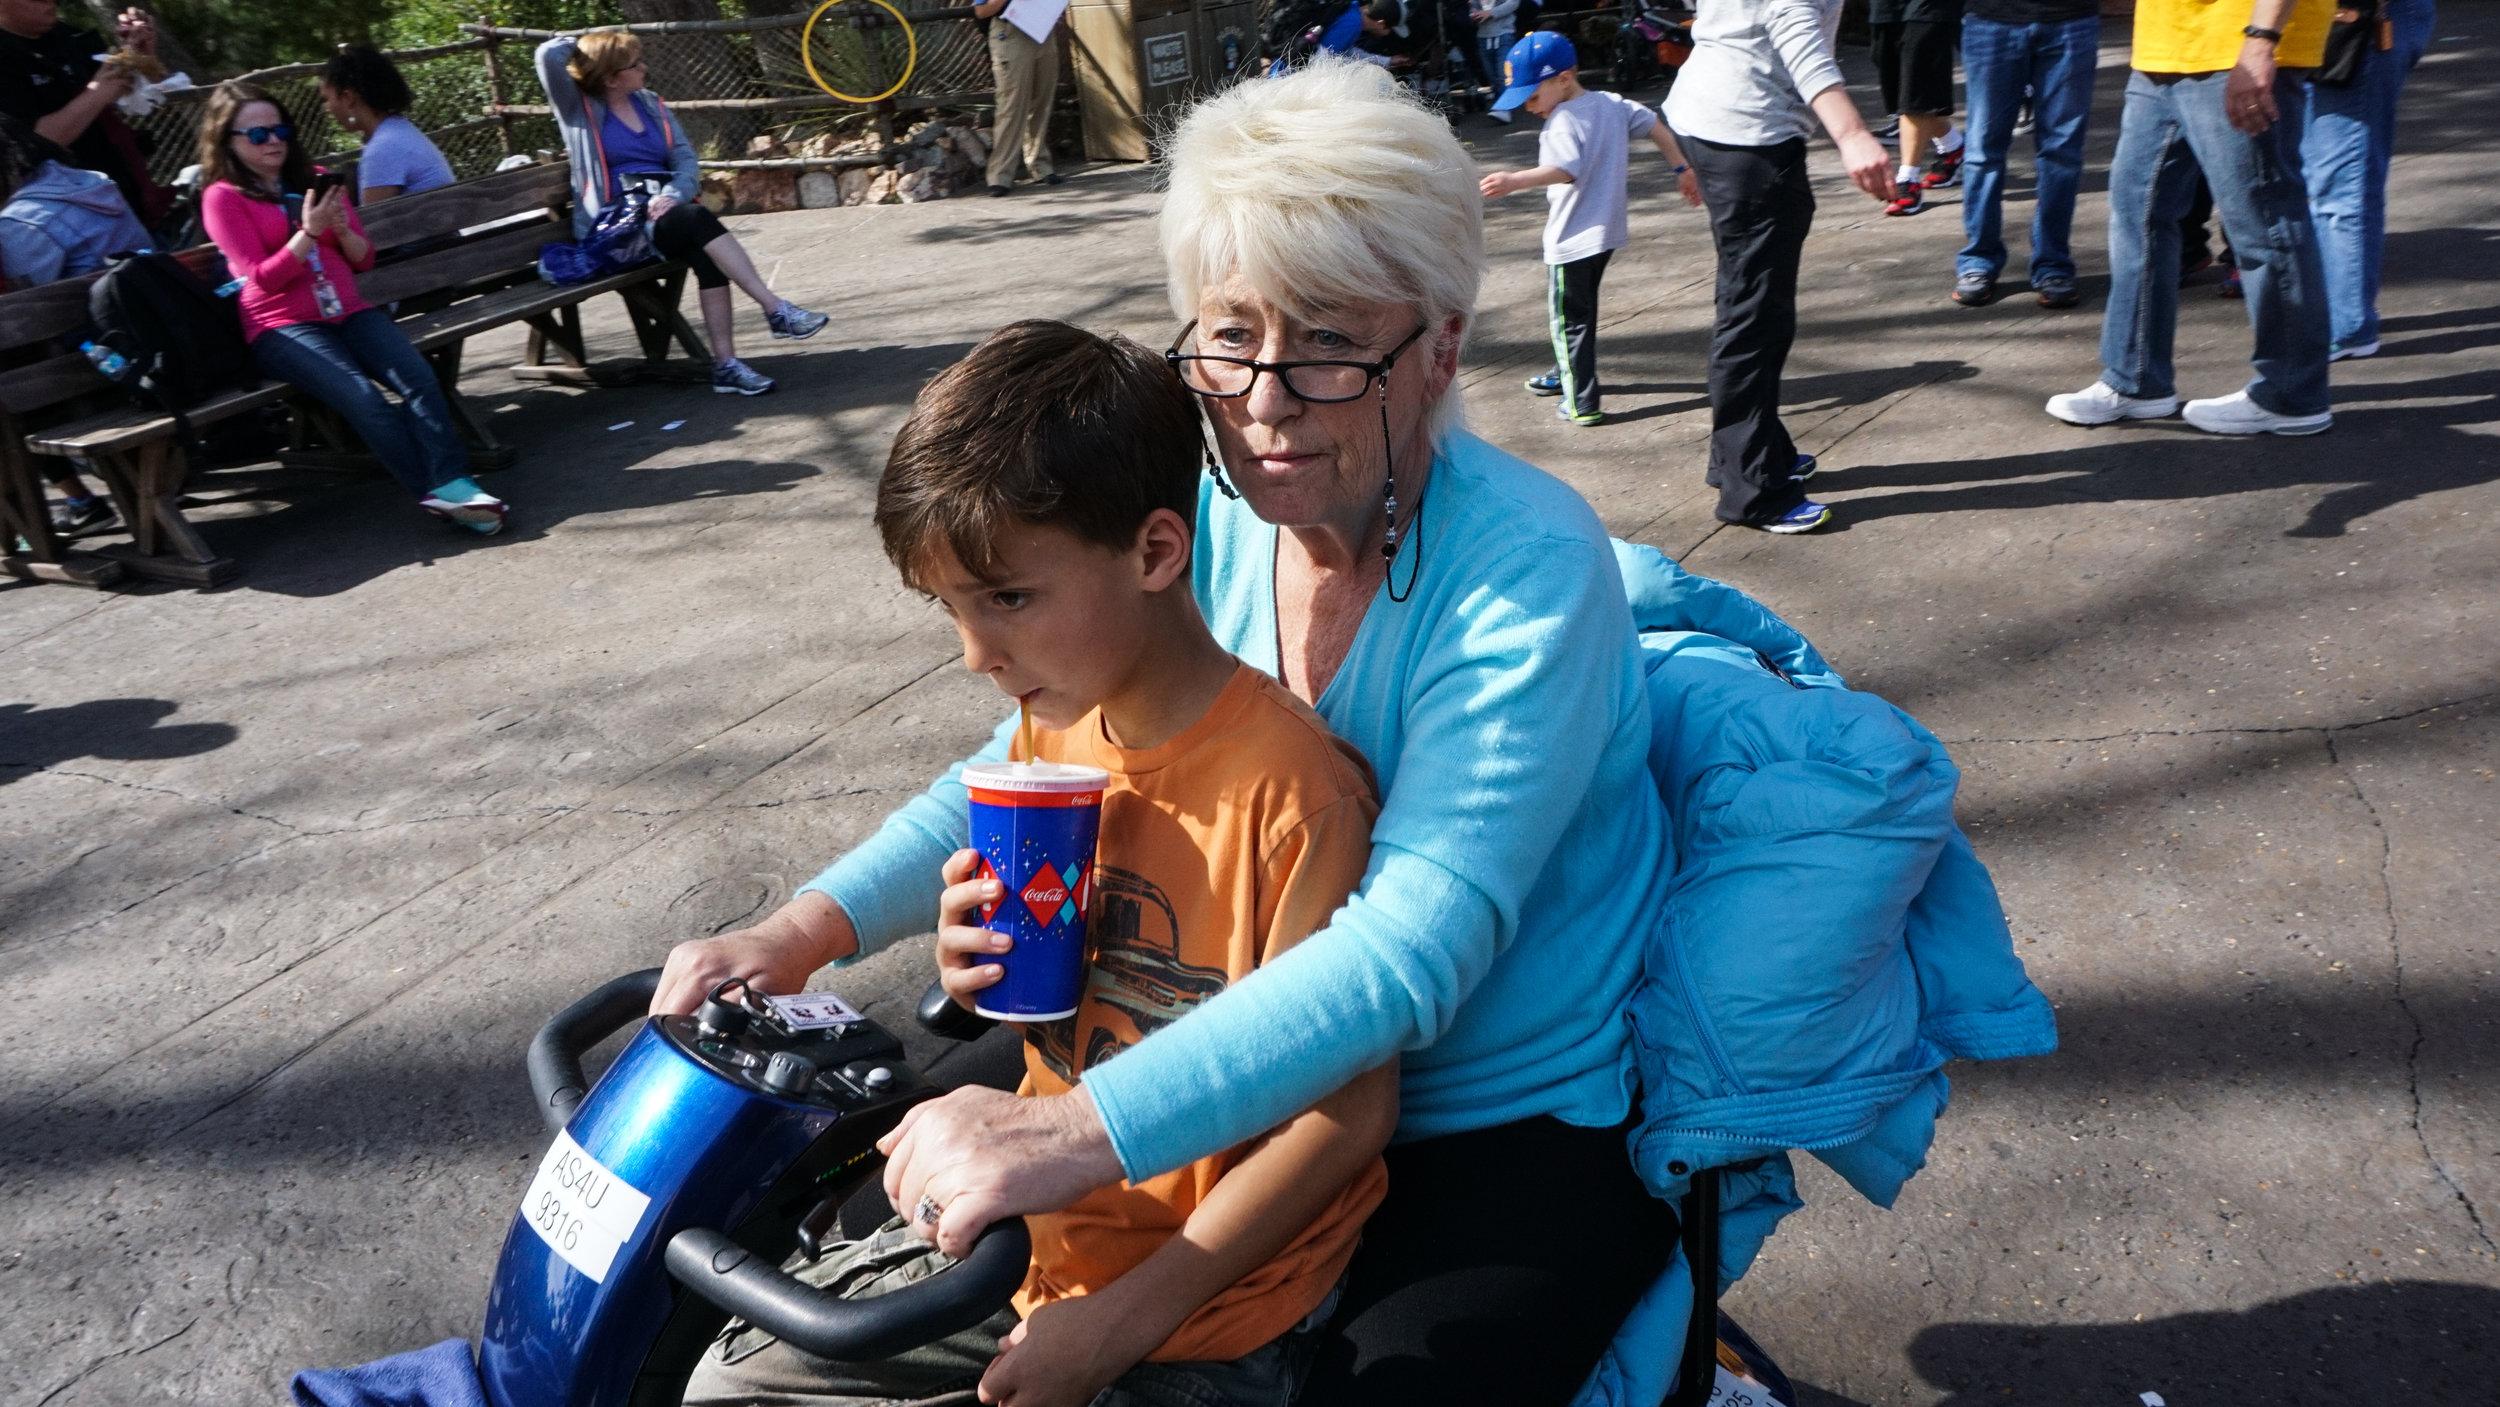 Grandma-3-03327.jpg